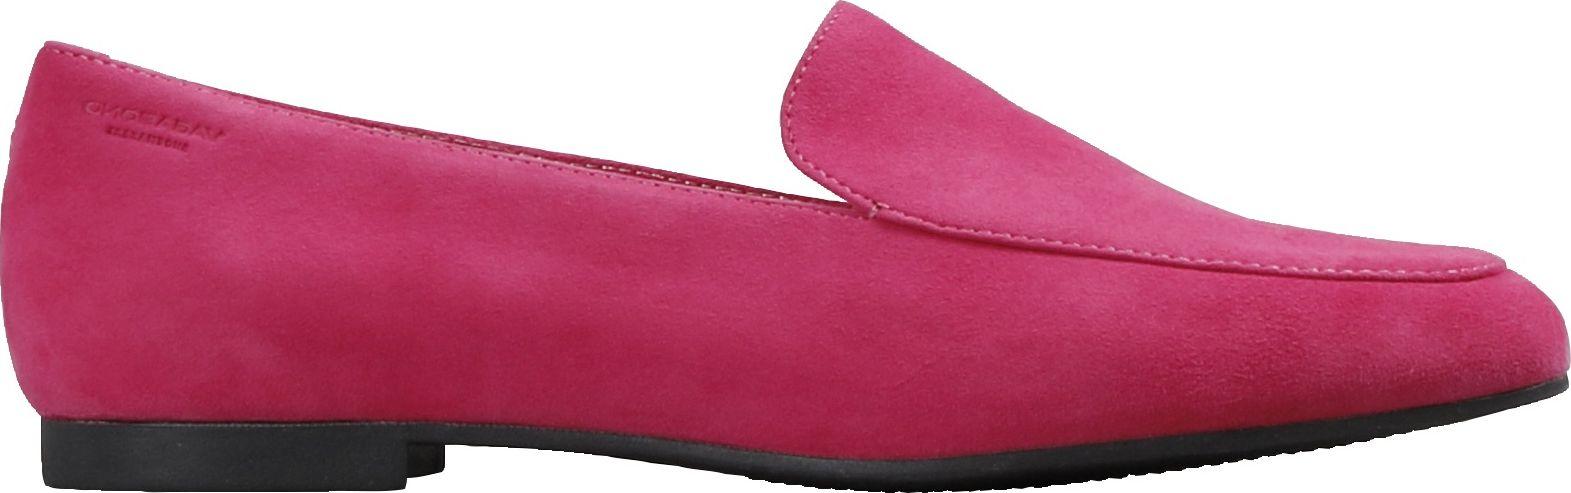 Vagabond Eliza 4718-040 Flamingo 38